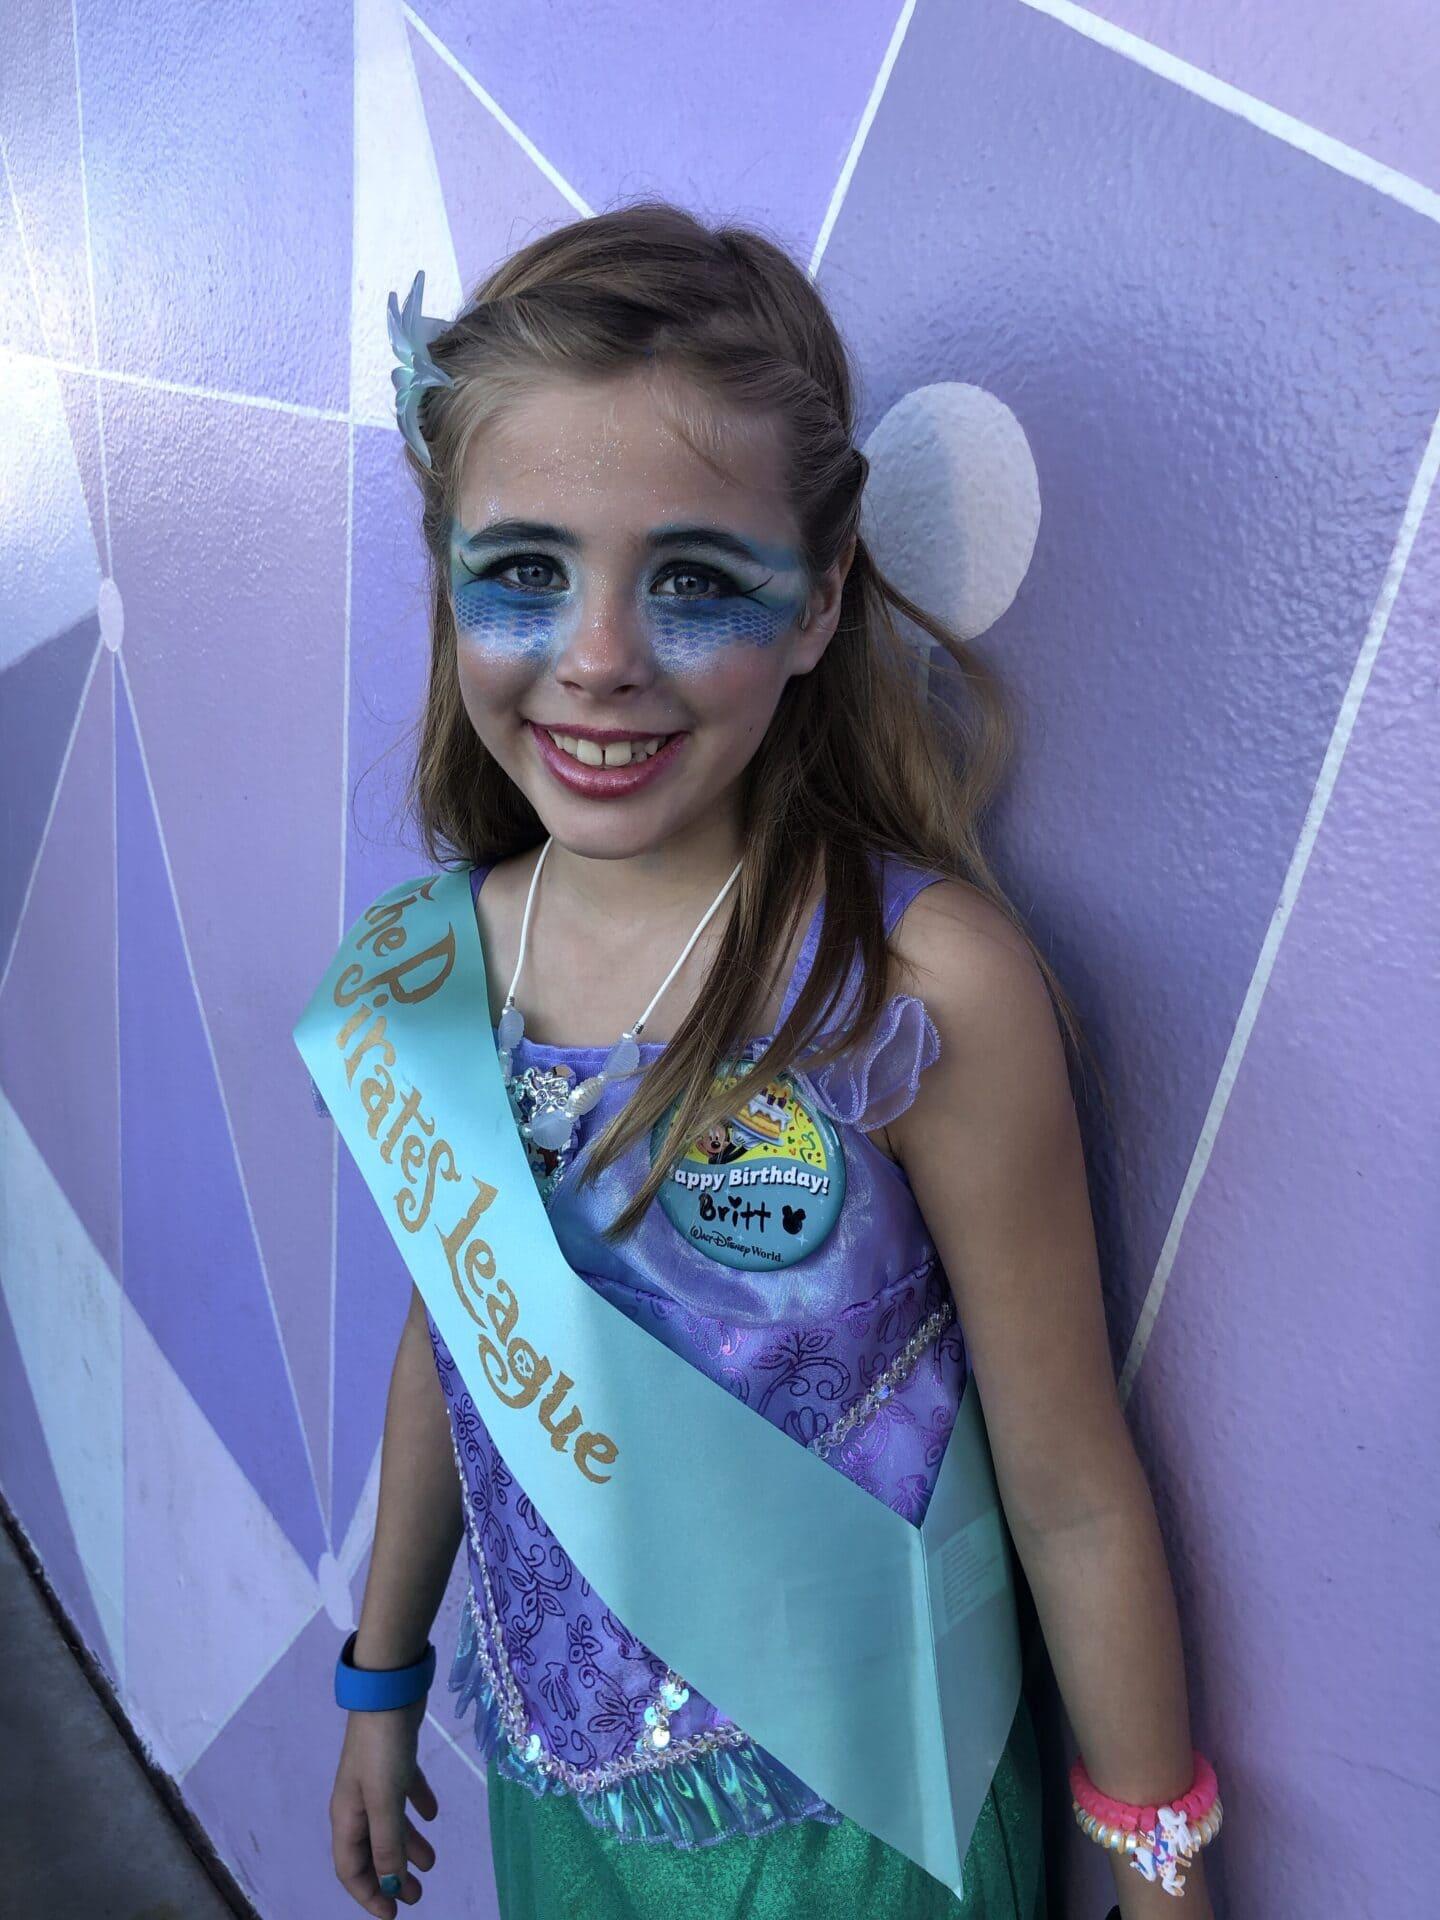 Britt's 8th Disney Birthday: Magic Kingdom and Pirate's League